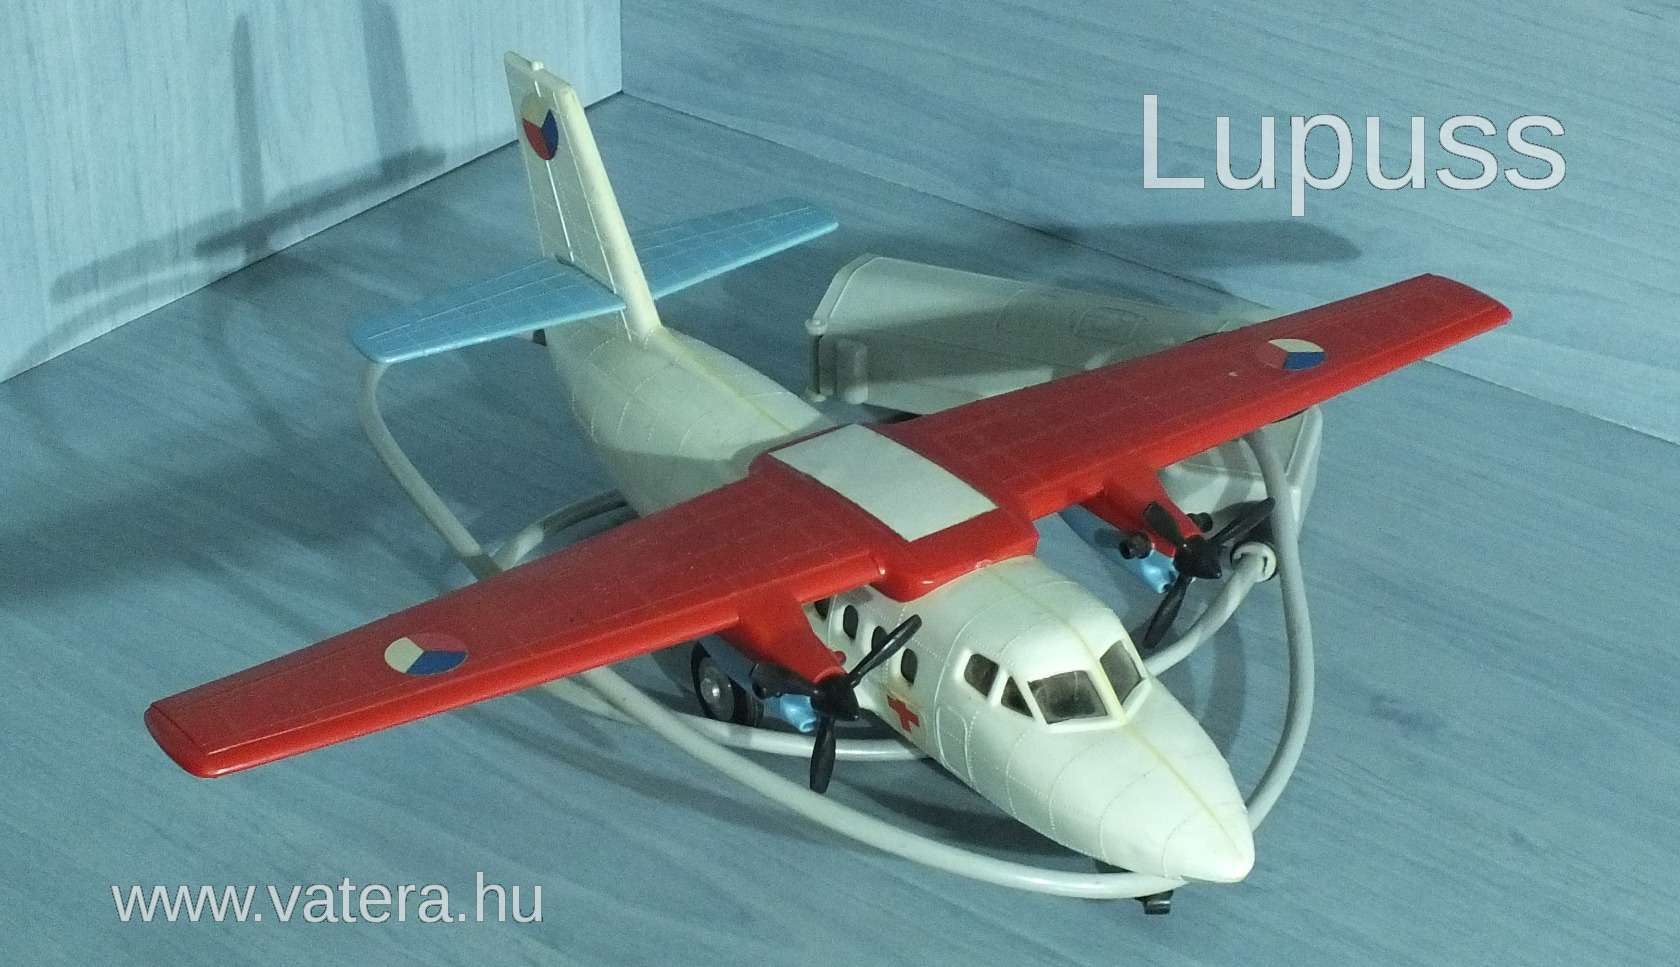 let-l-410-ites-repulo-tavos-kabeles-szep-toresmentes-allapot-mukodokepes-821a_1_big.jpg